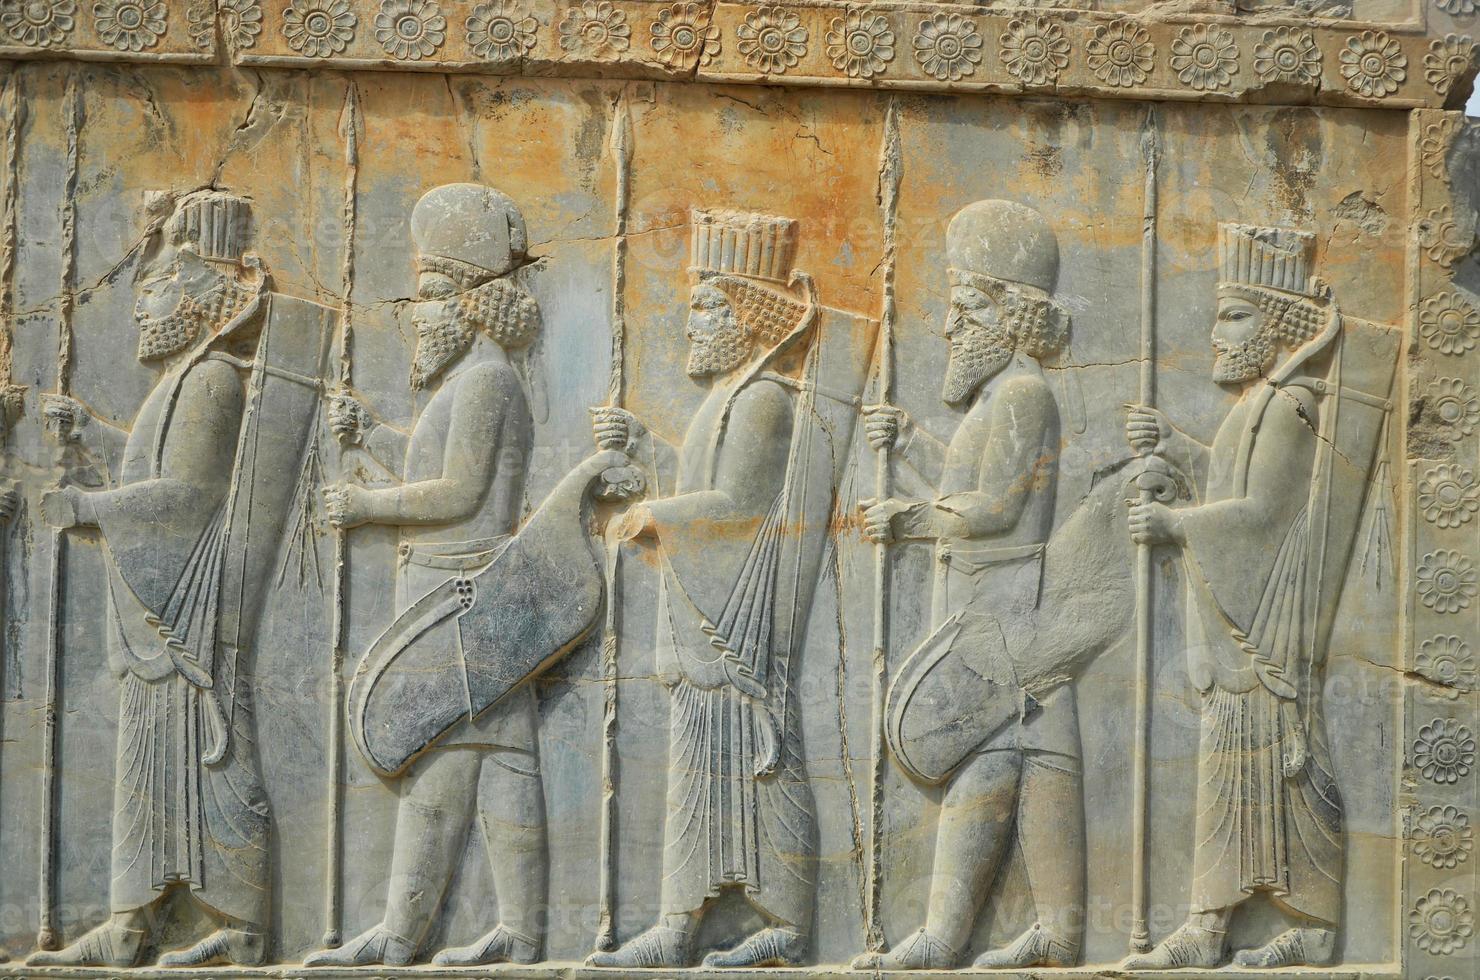 iran persepolis persan culture monument photo